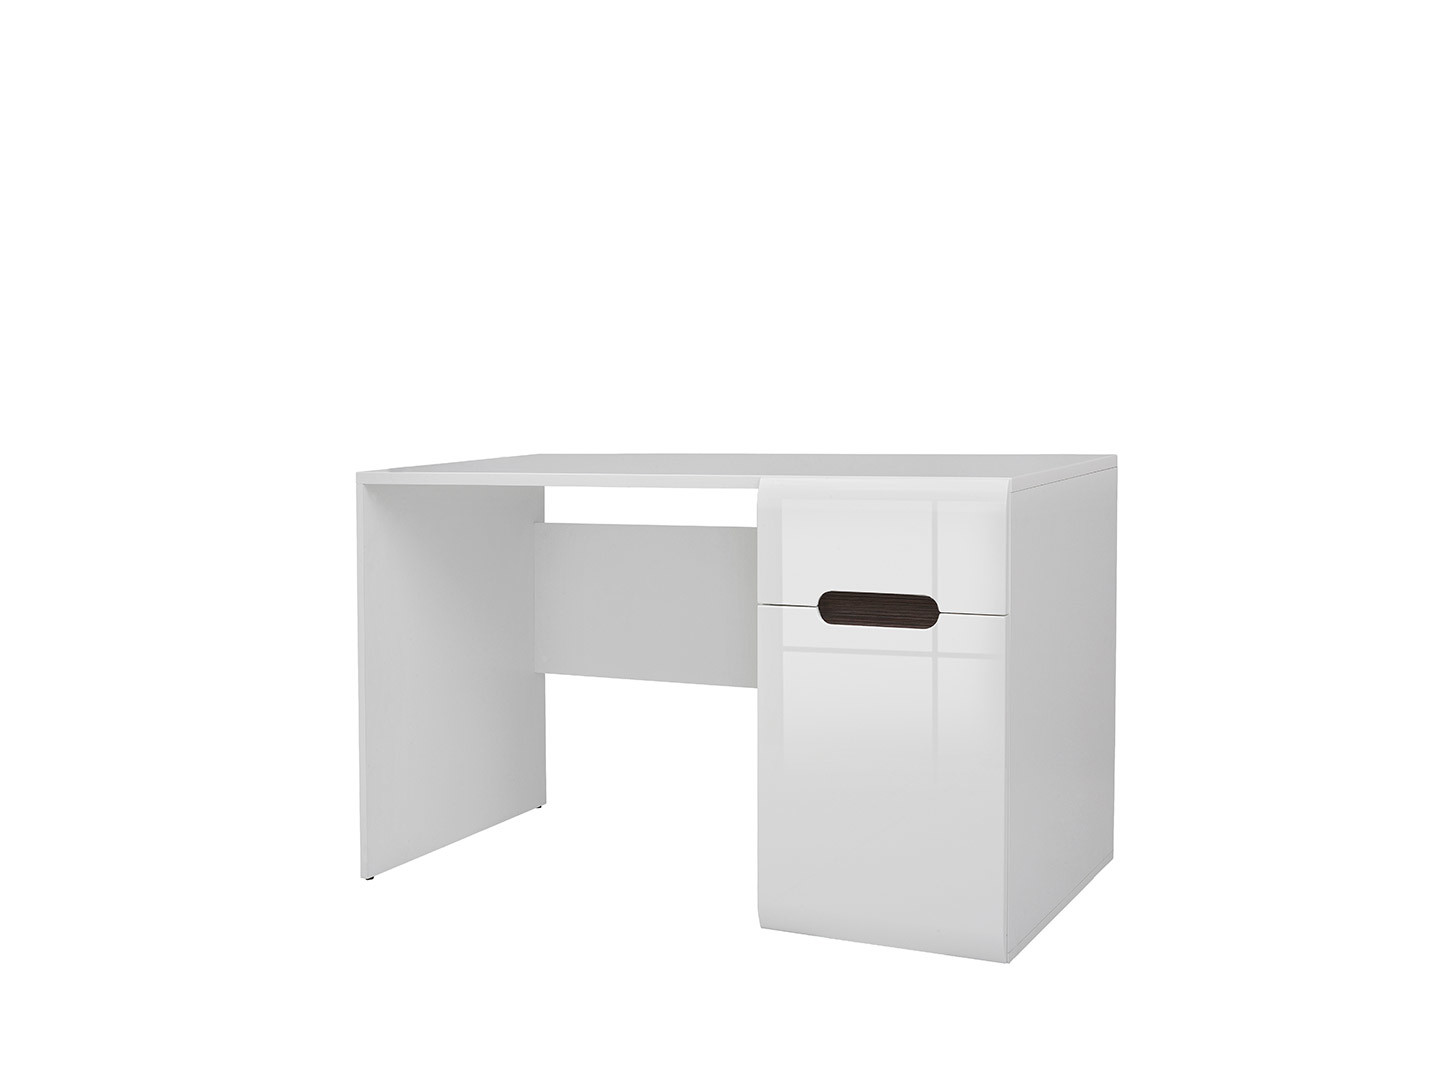 Písací stôl AZTECA TRIO BIU1D1S/8/12 biela/biely lesk